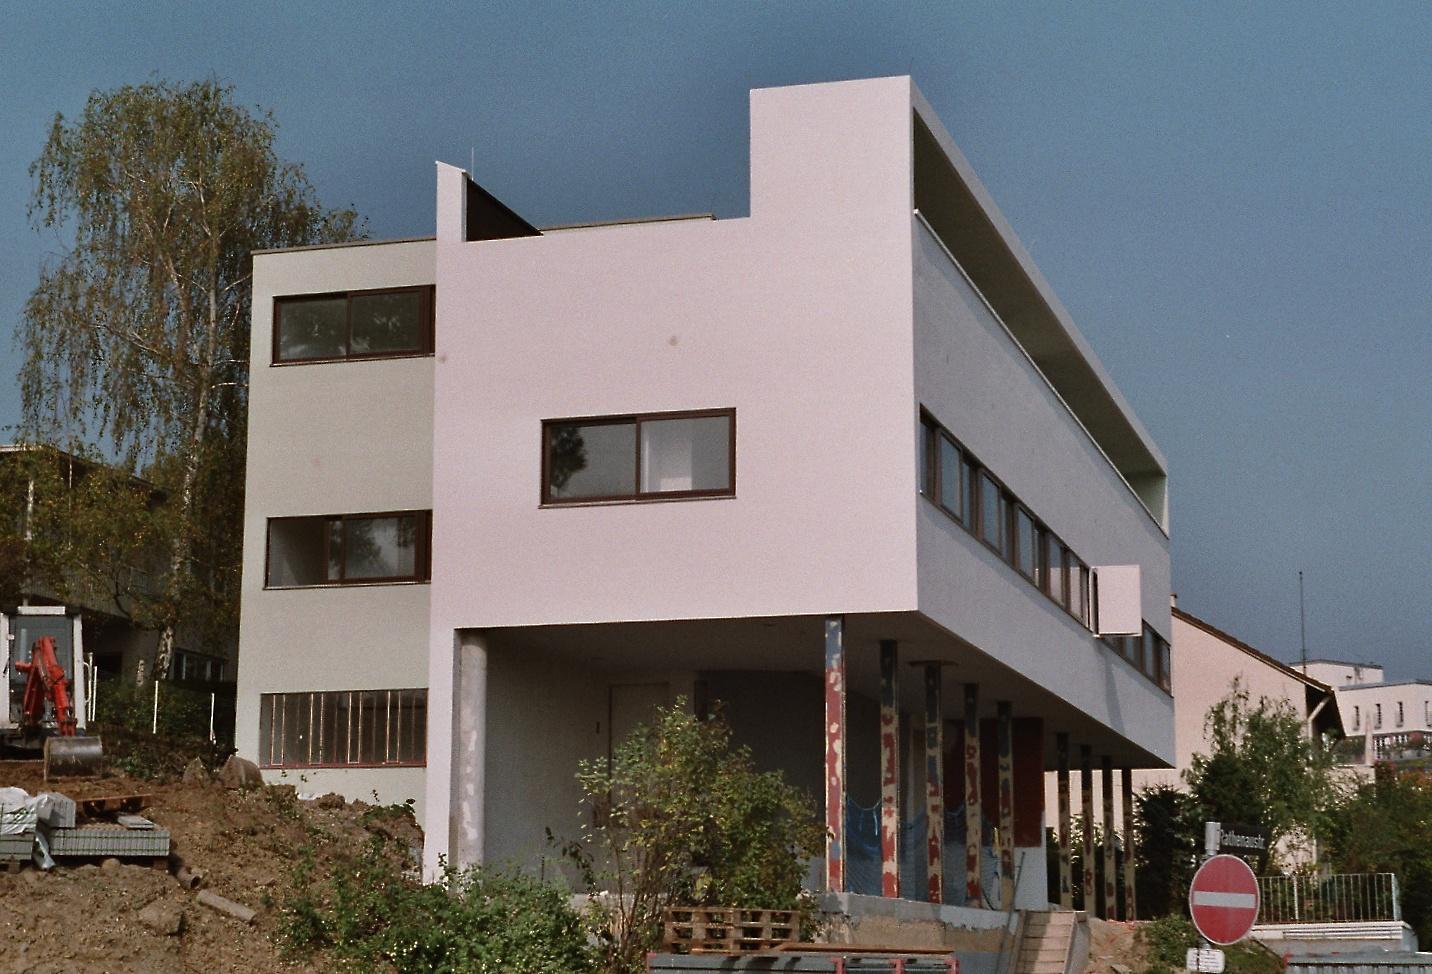 Le corbusier for Villas weissenhofsiedlung